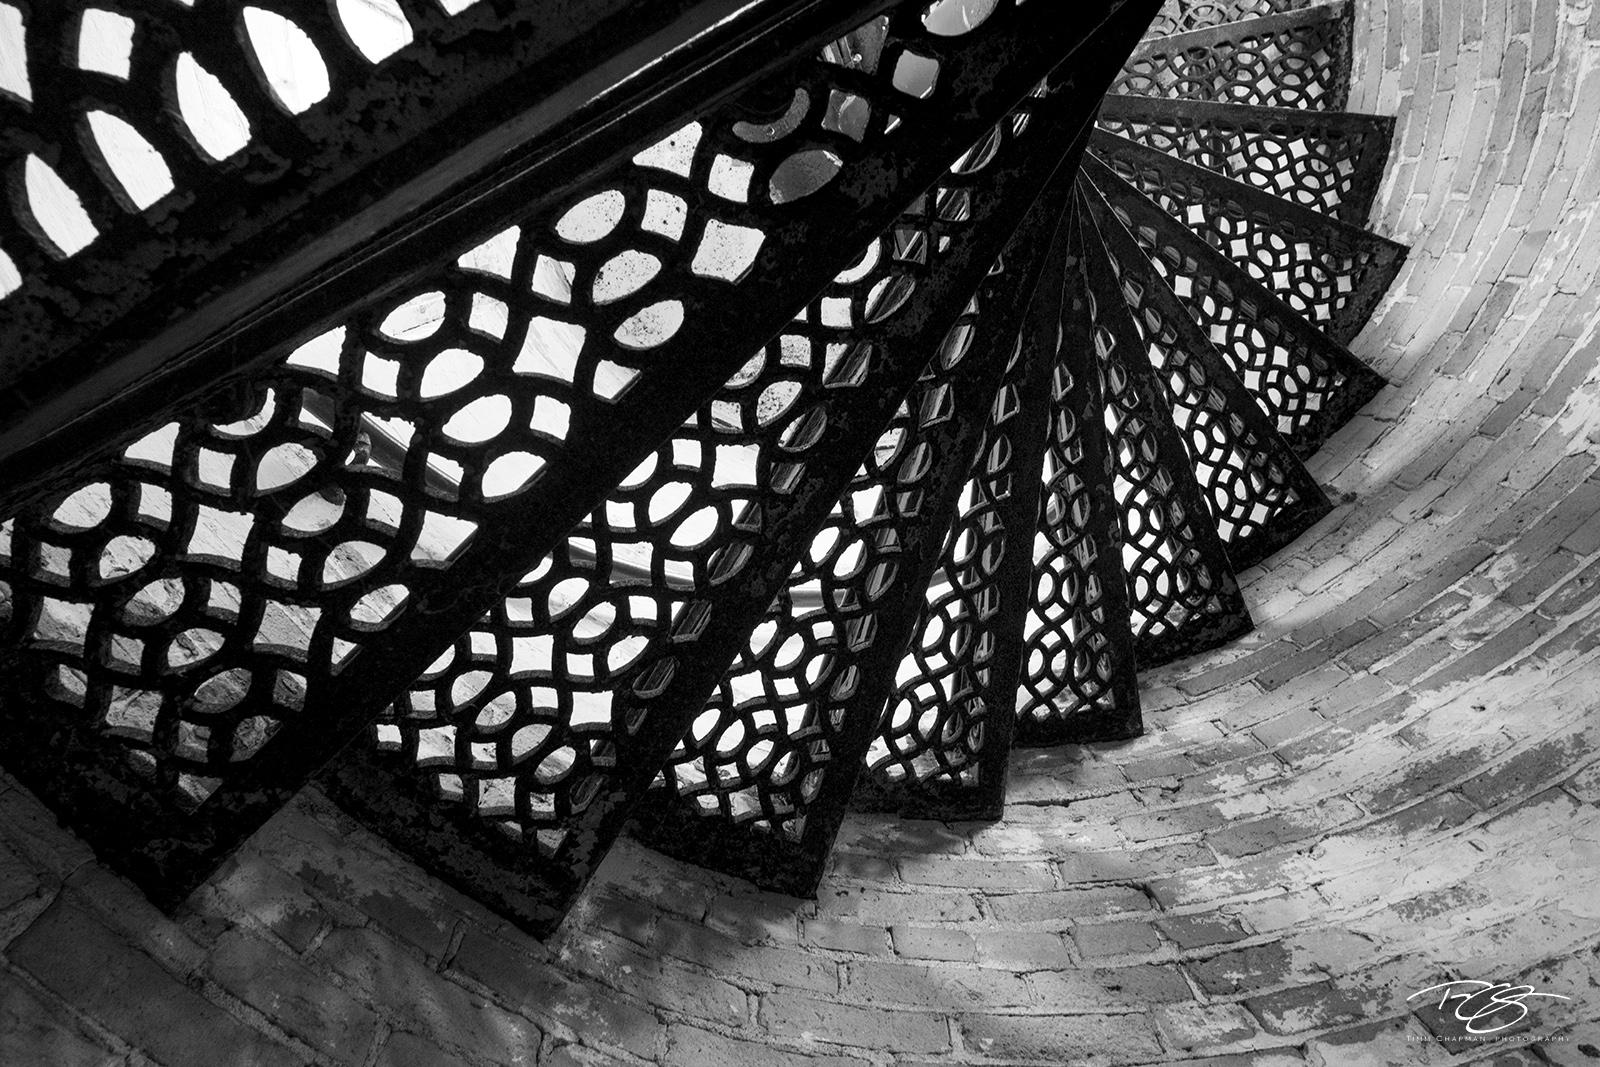 lighthouse, Looking Down, lake michigan, mackinaw, mackinaw city, michigan, light, beacon, staircase, spiral, abstract, steps, winding, peeling paint, window, black & white, monochrome, photo